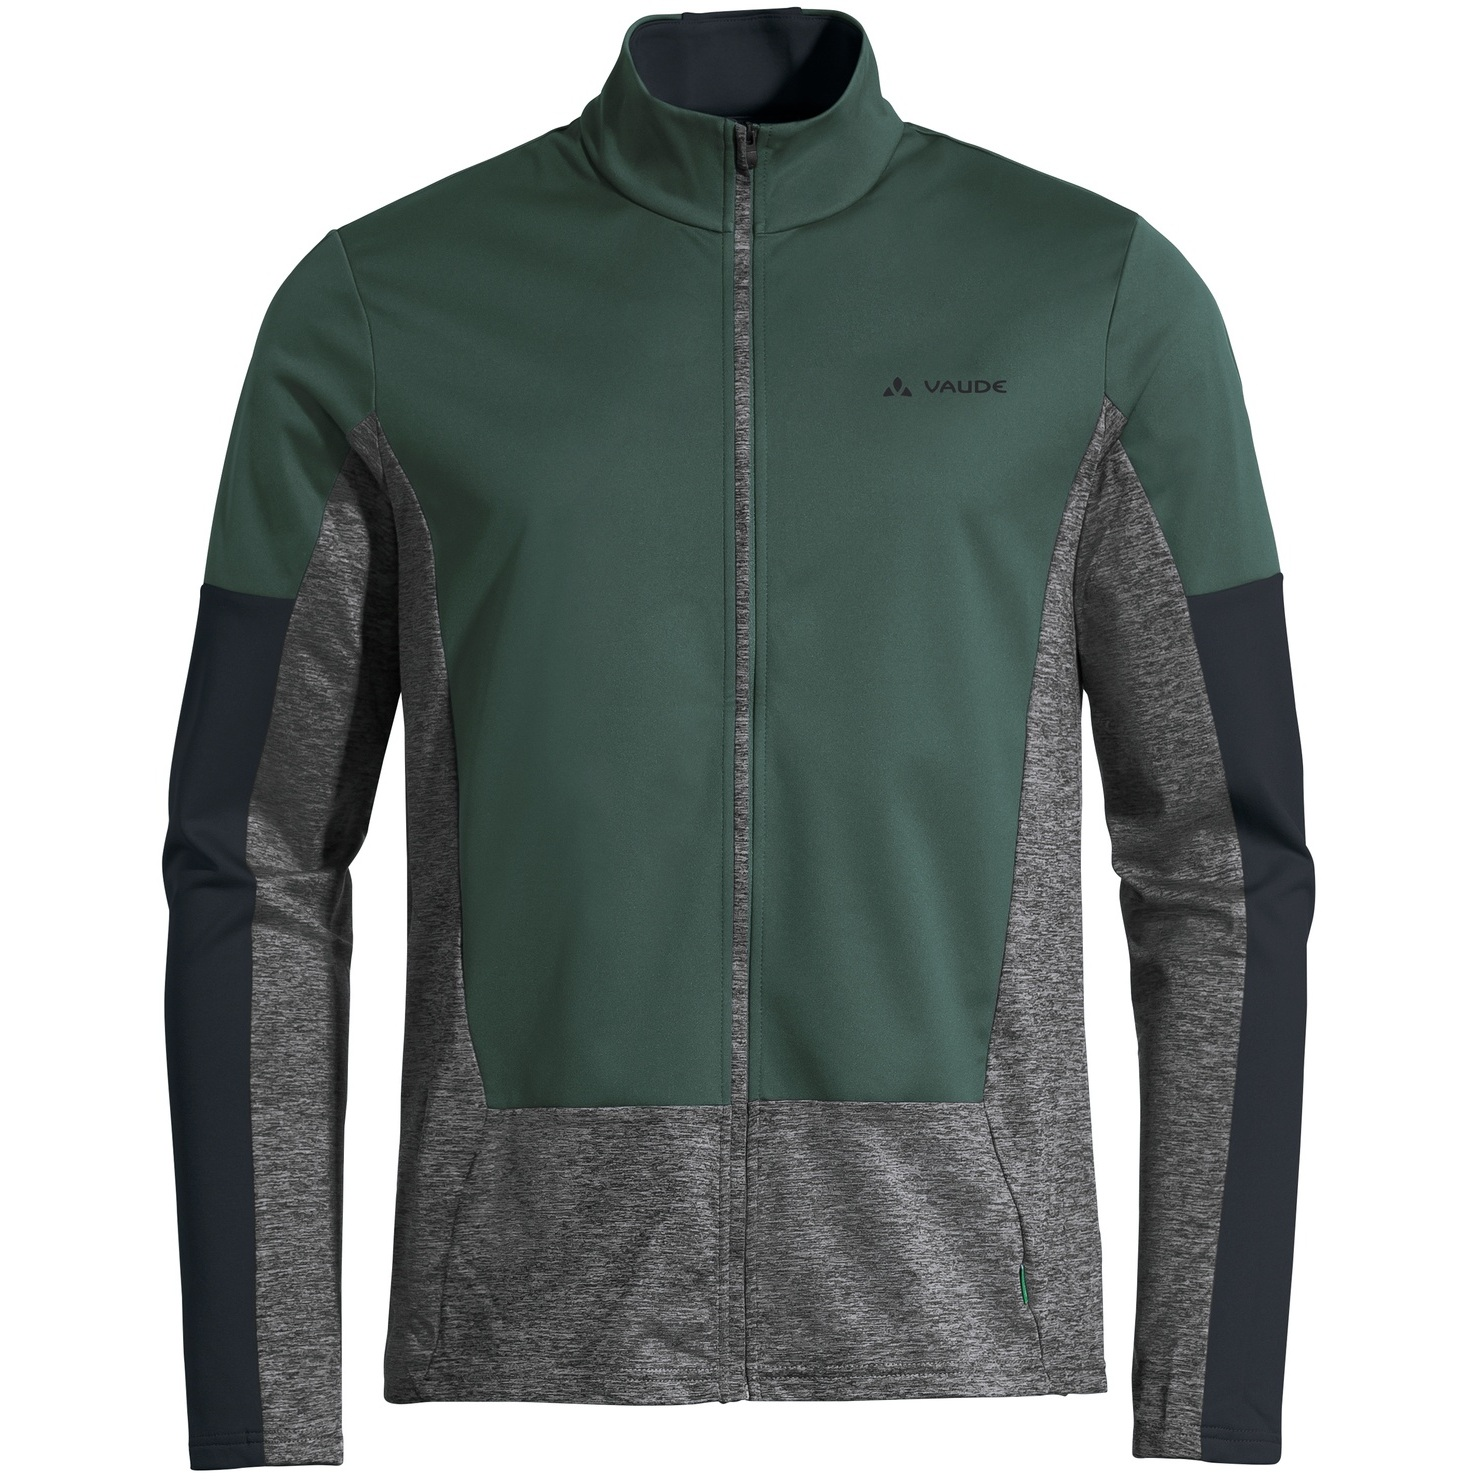 Vaude Men's All Year Moab FZ T-Shirt Longsleeve - dusty forest